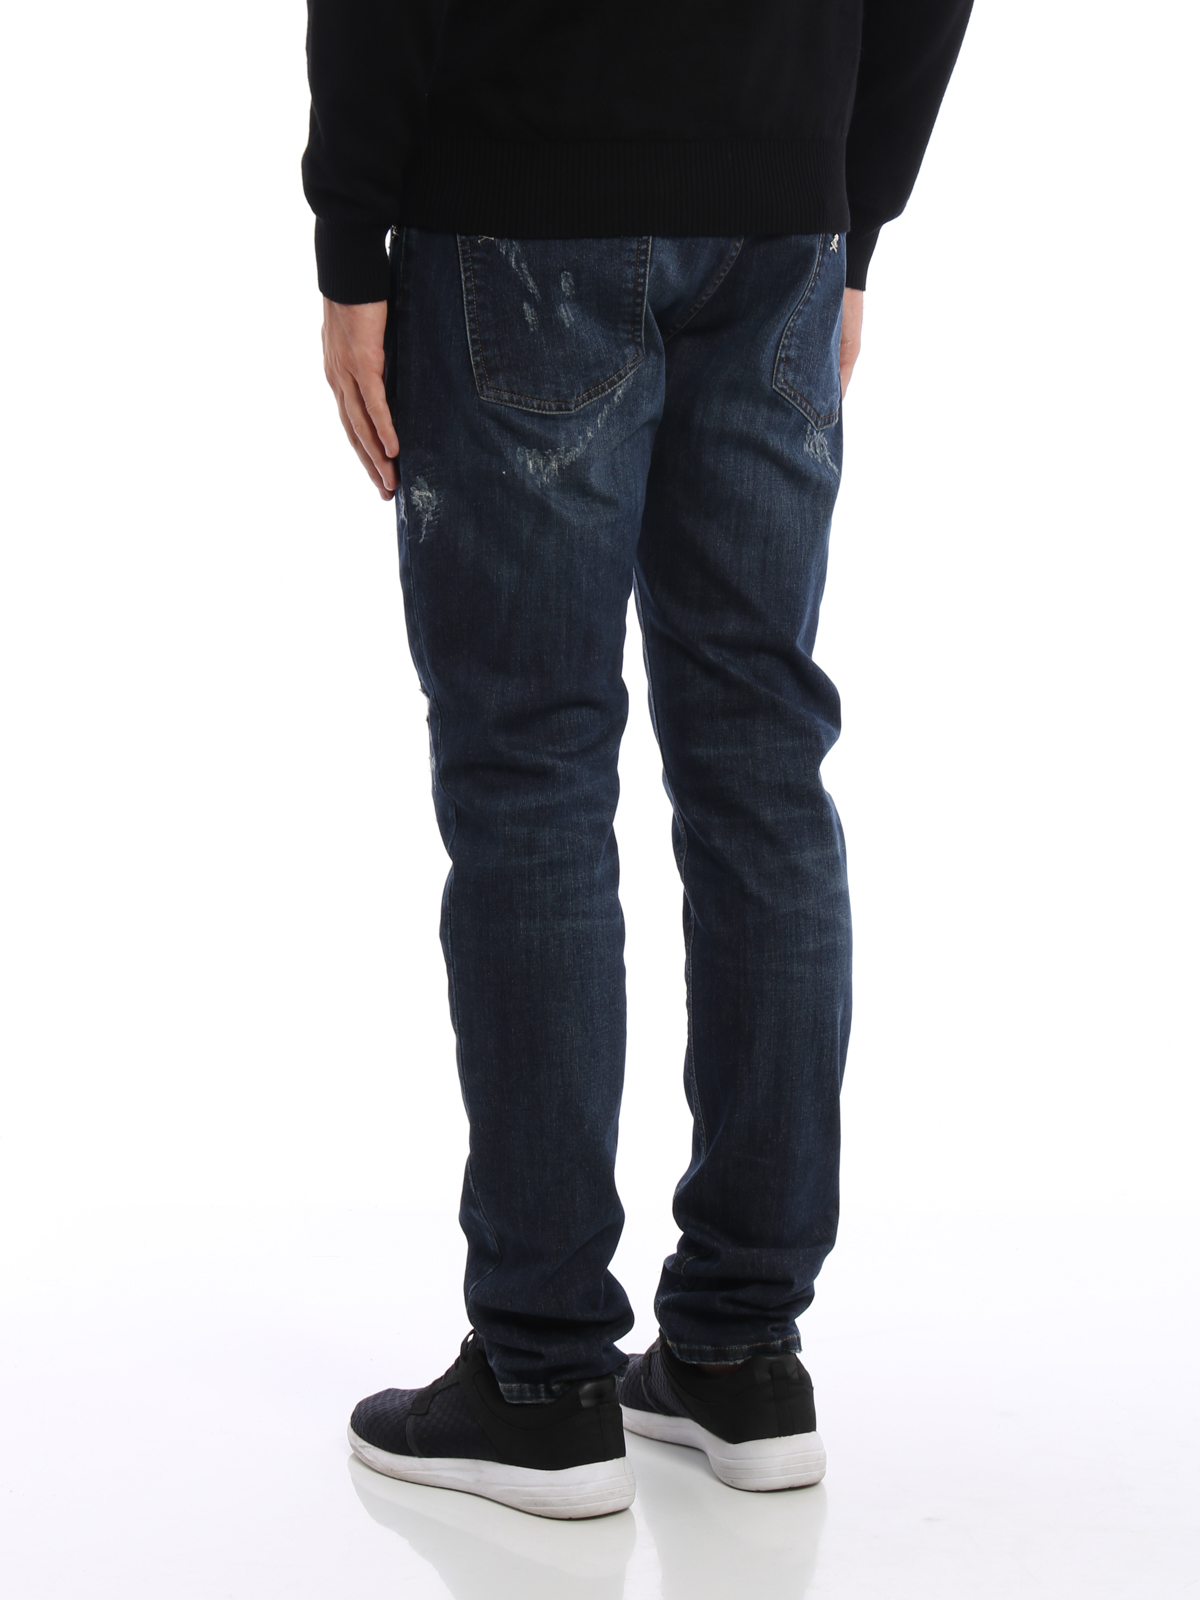 philipp plein akio used effect straight leg jeans straight leg jeans mdt029614da. Black Bedroom Furniture Sets. Home Design Ideas